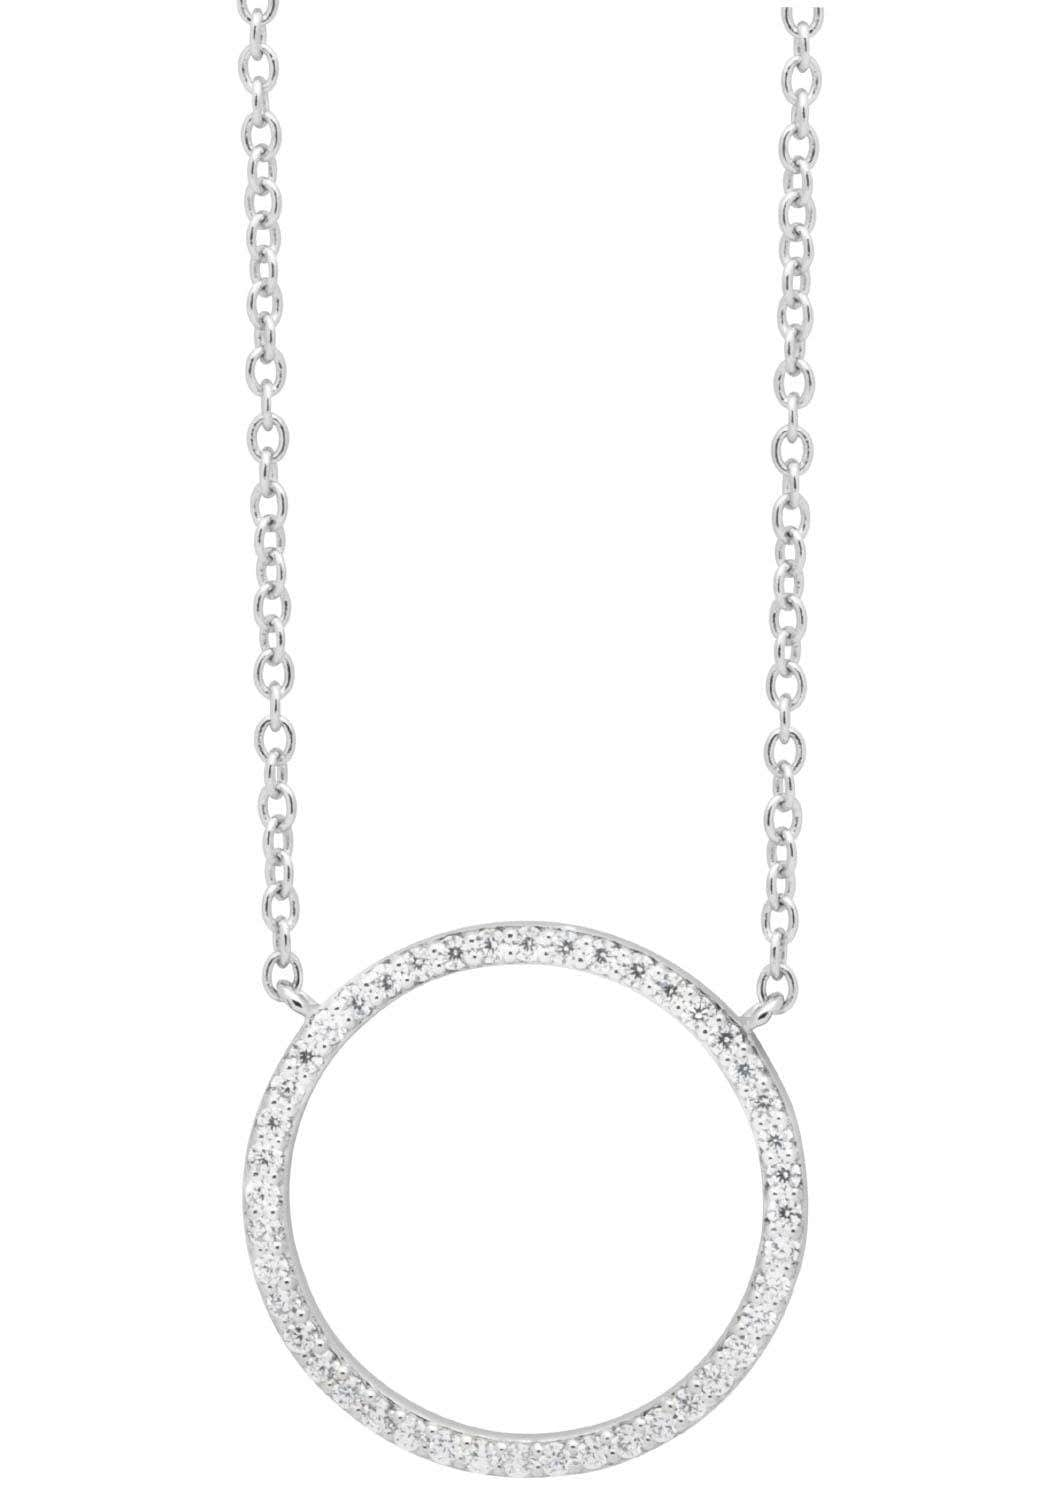 NANA KAY Kette mit Anhänger Kreis Playful Circles ST1596   Schmuck > Halsketten > Ketten mit Anhänger   Nana Kay